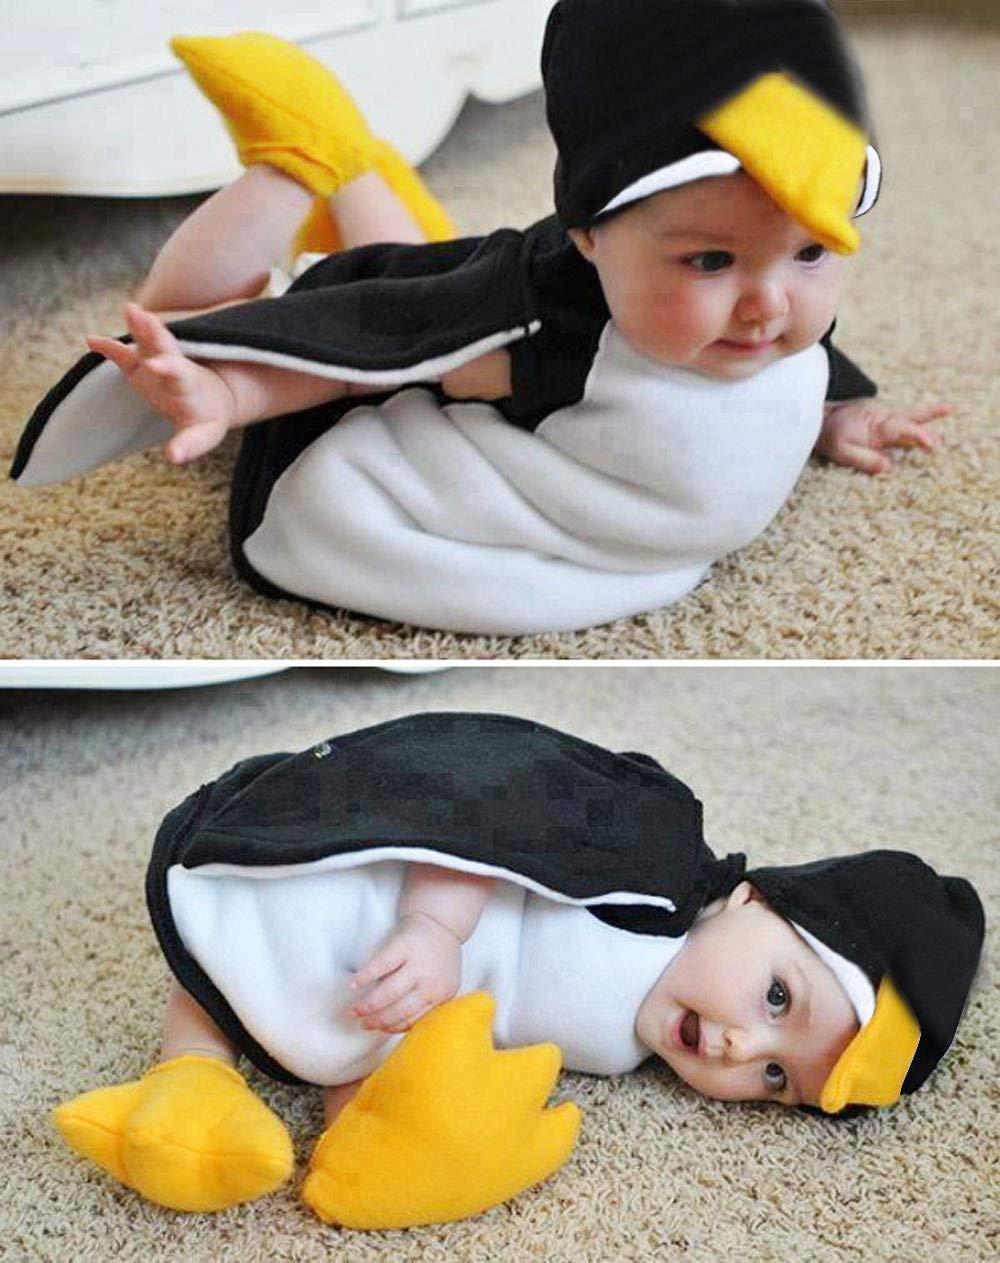 TOOPOOT Baby Newborn Cute Romper,Newborn Infant Baby Boys Girls Cosplay Cartoon Penguin Romper Footwear Outfits